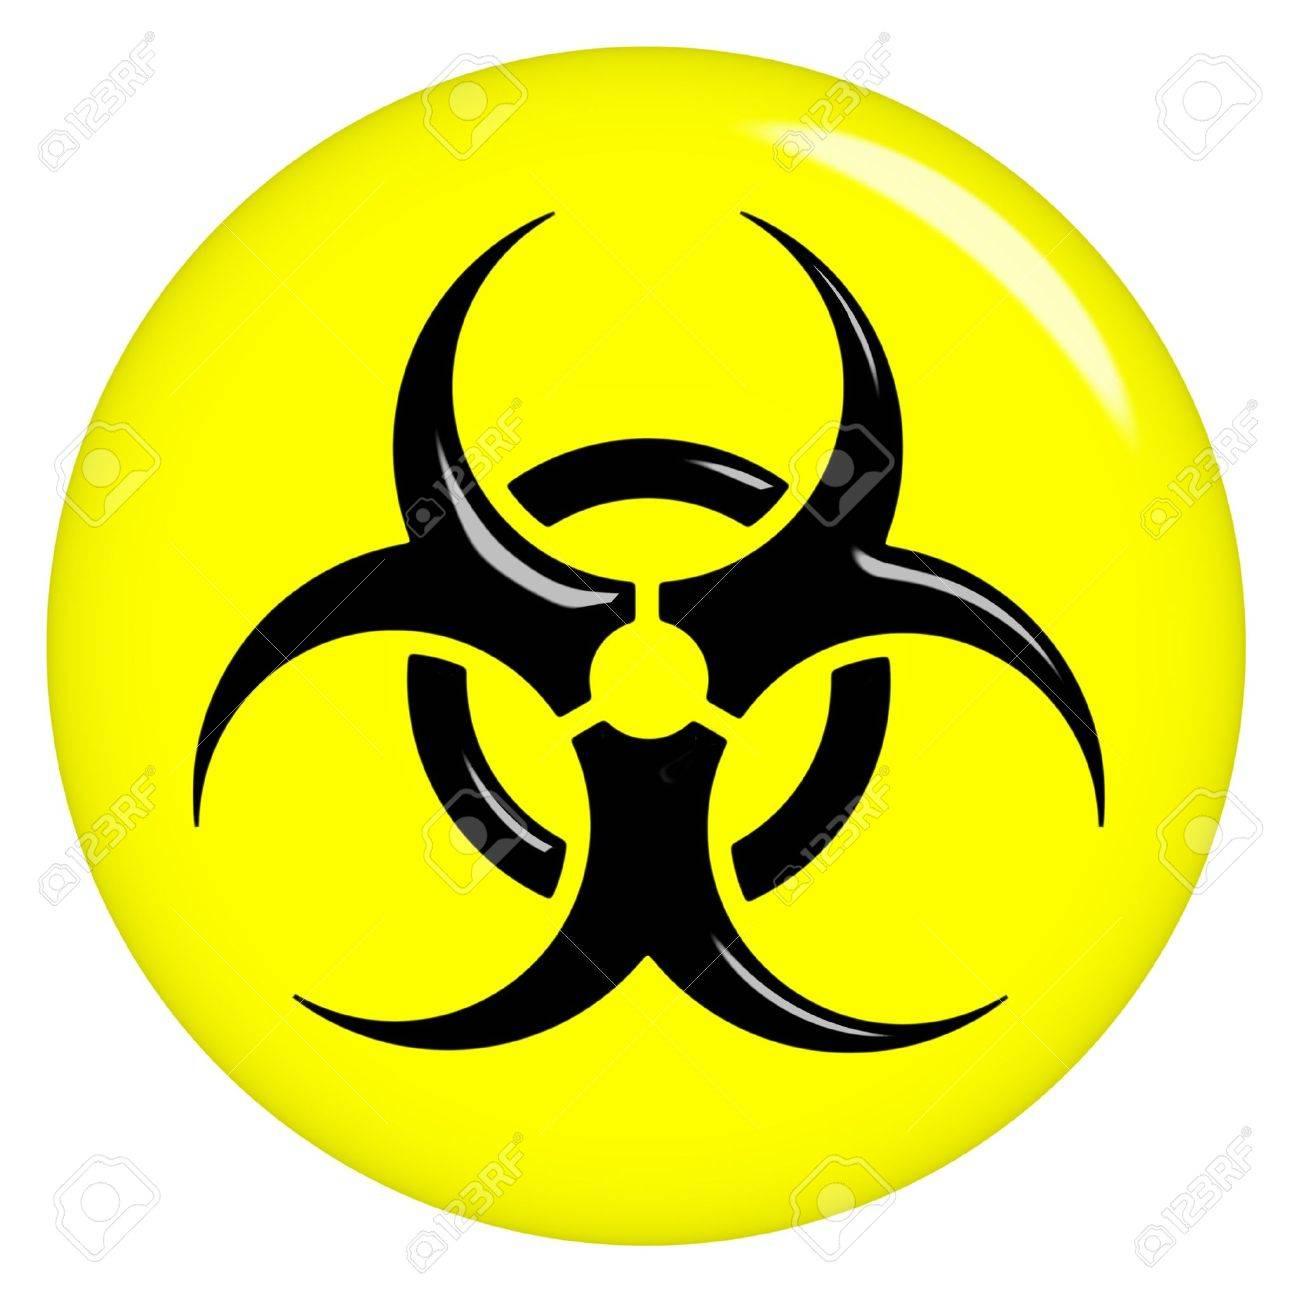 3d biohazard sign Stock Photo - 7352790